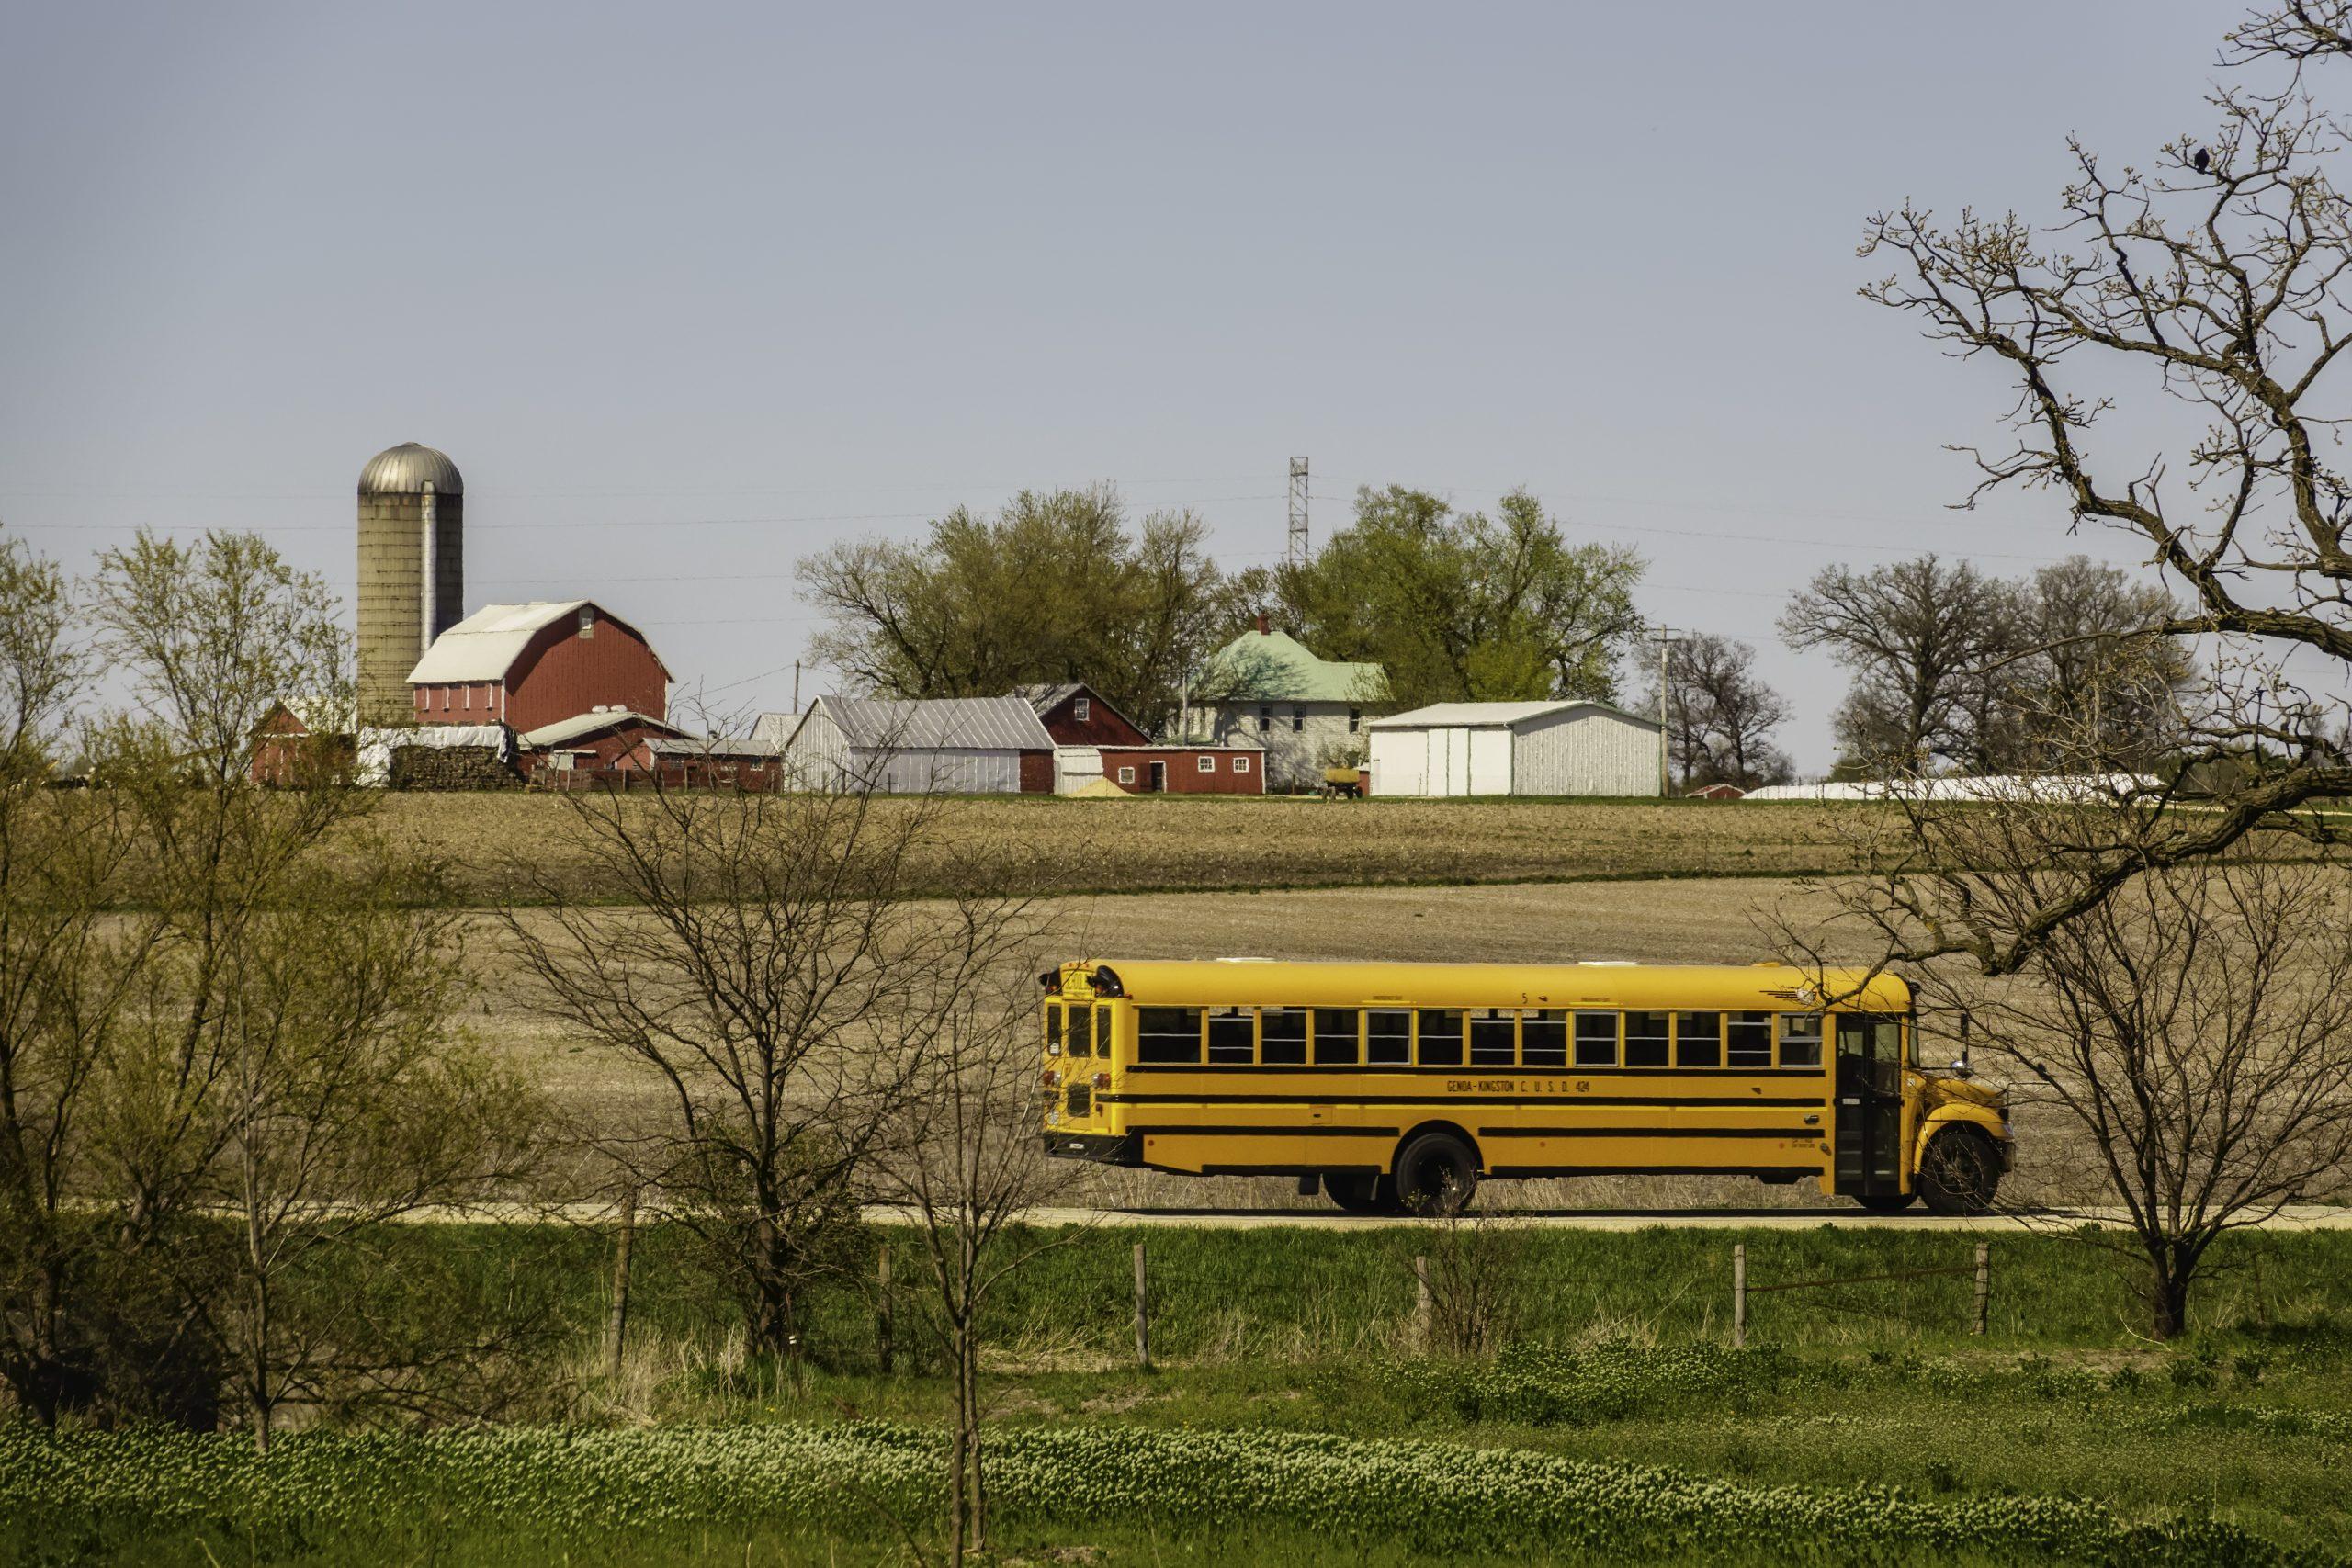 Rural school bus